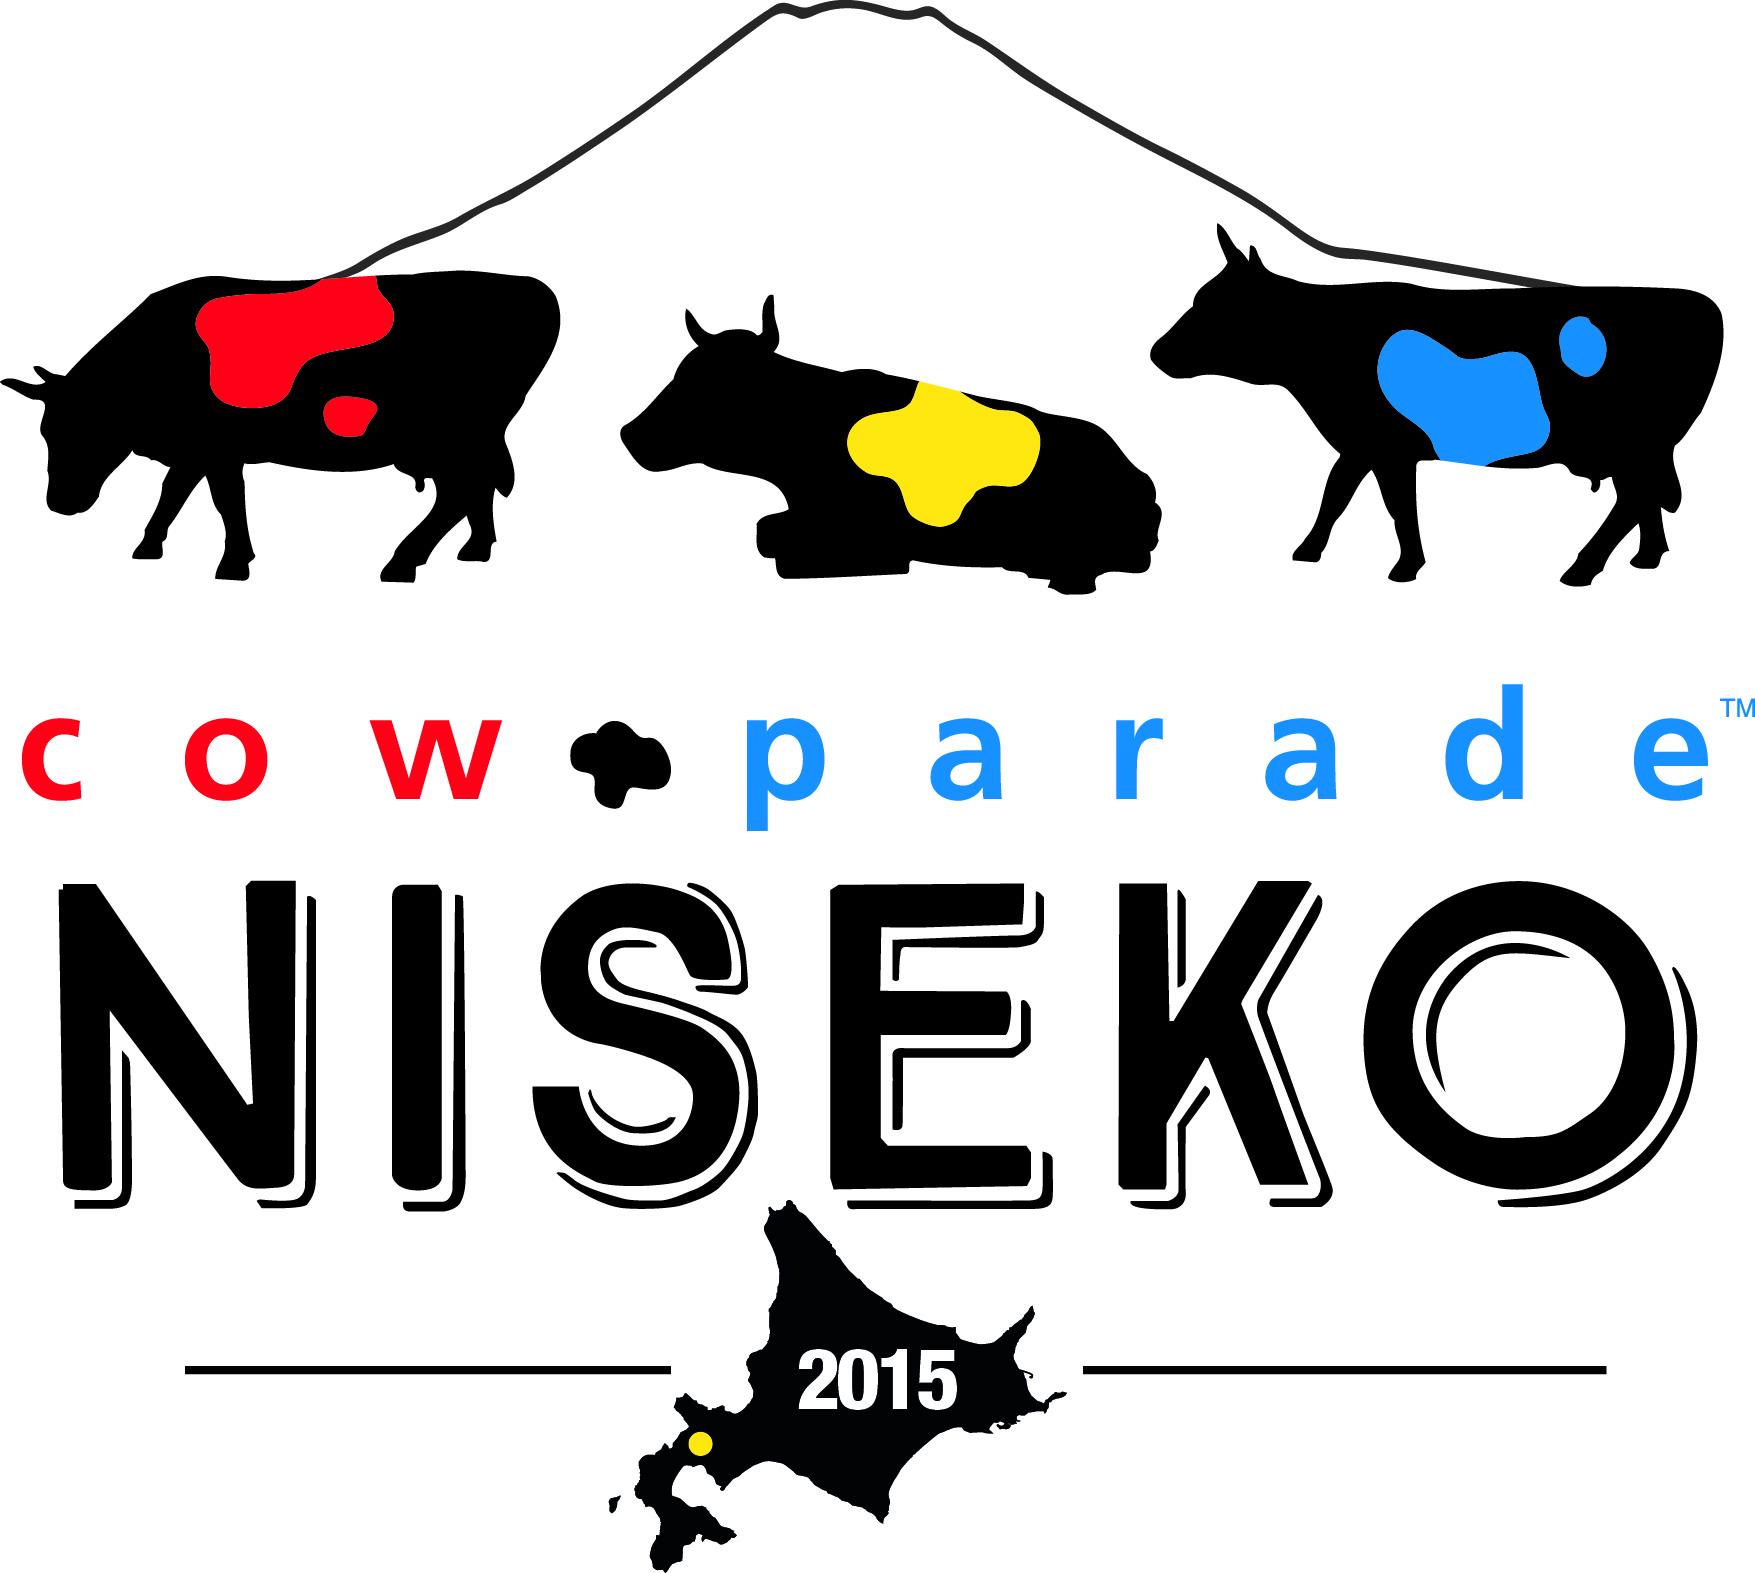 CP niseko logo